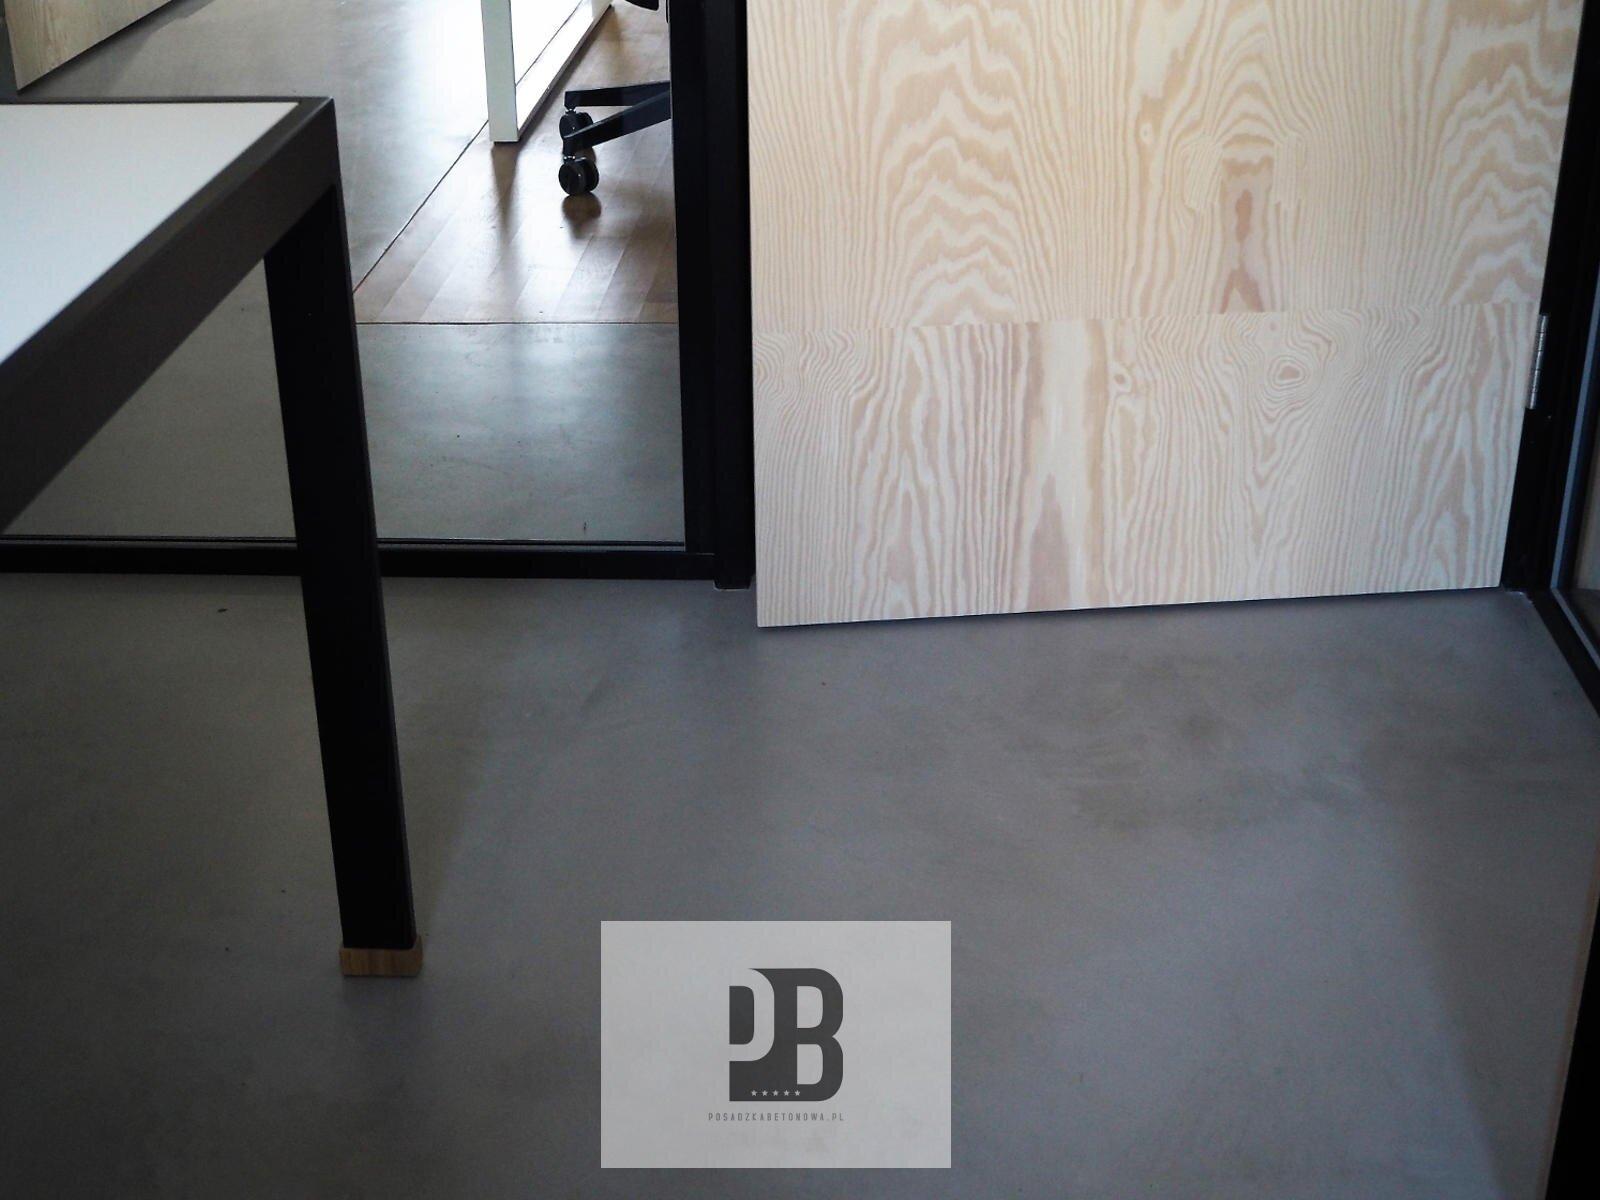 posadzki-betonowe-do-biura-dekoracyjne-mikrocementowe1